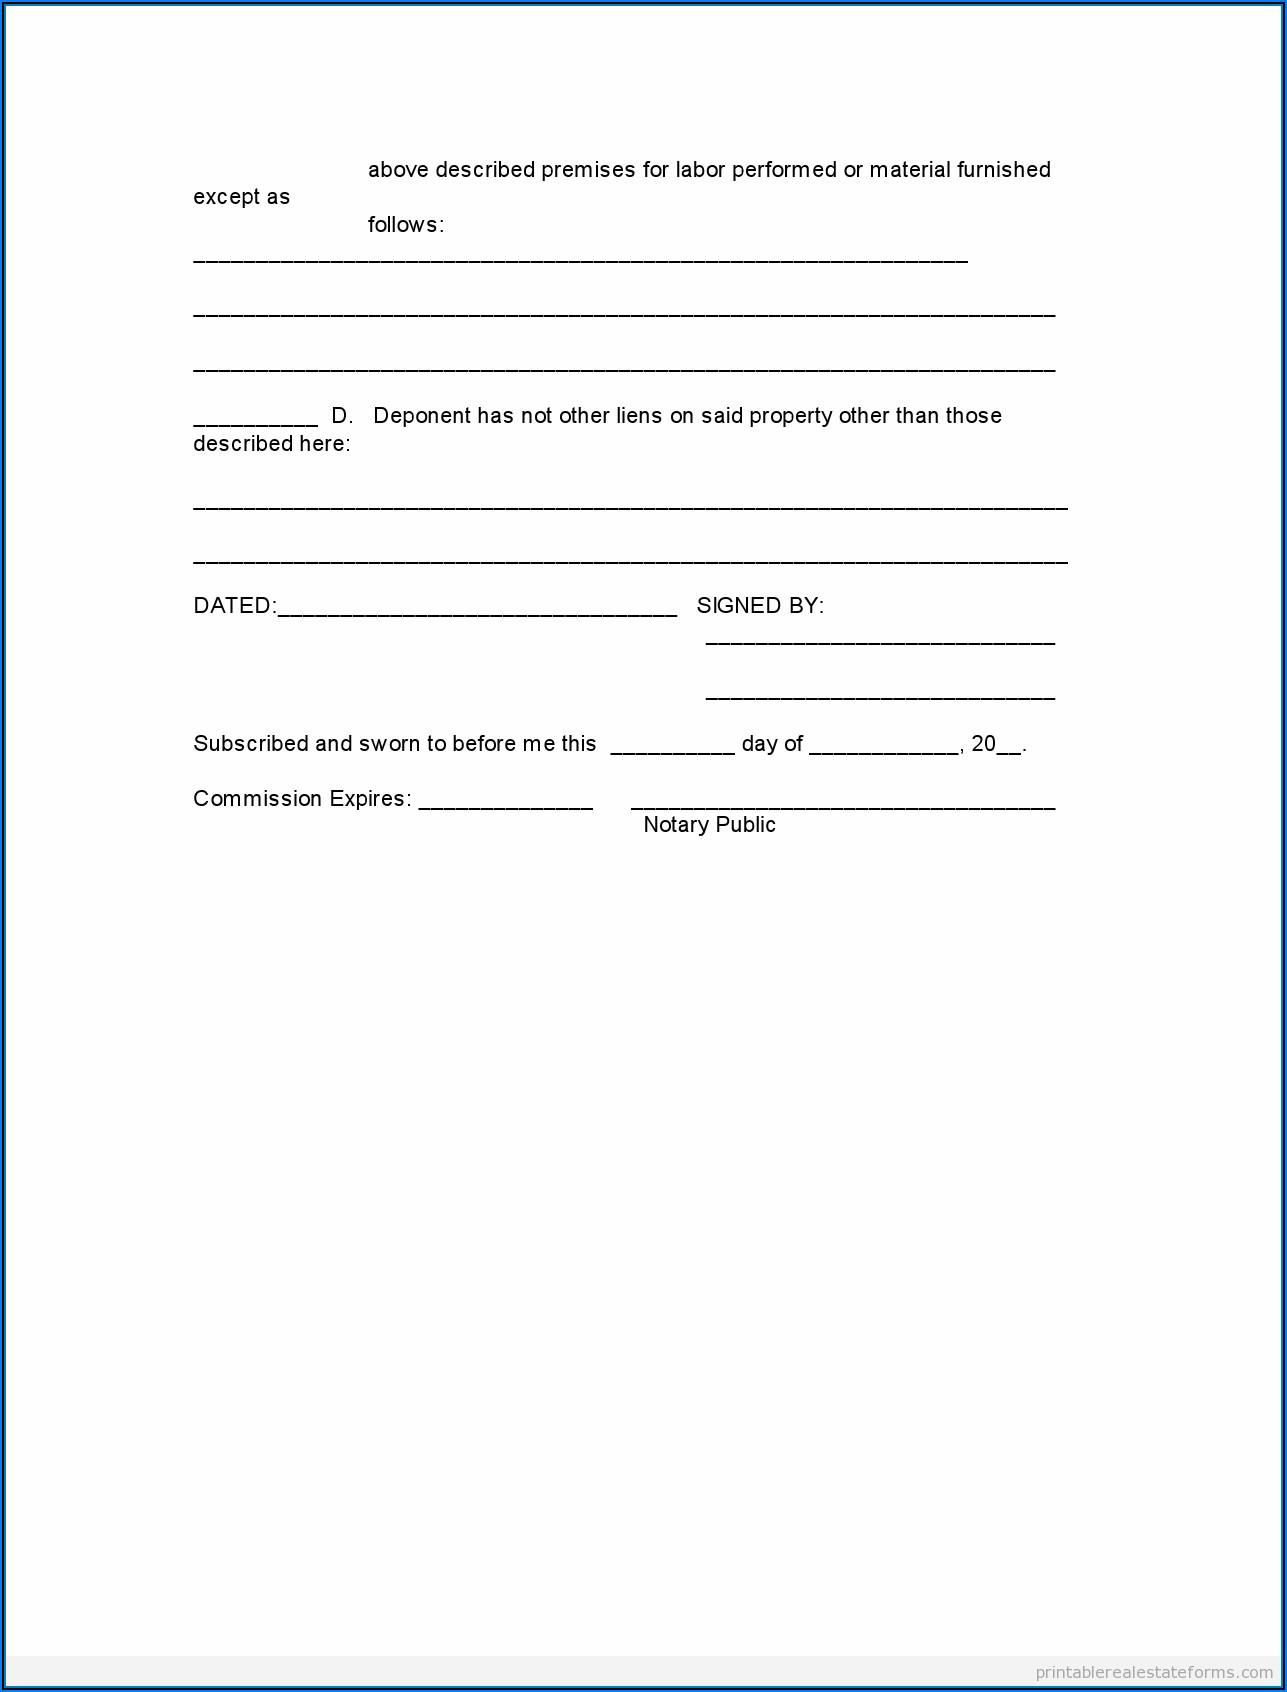 Free Printable Affidavit Statement Form